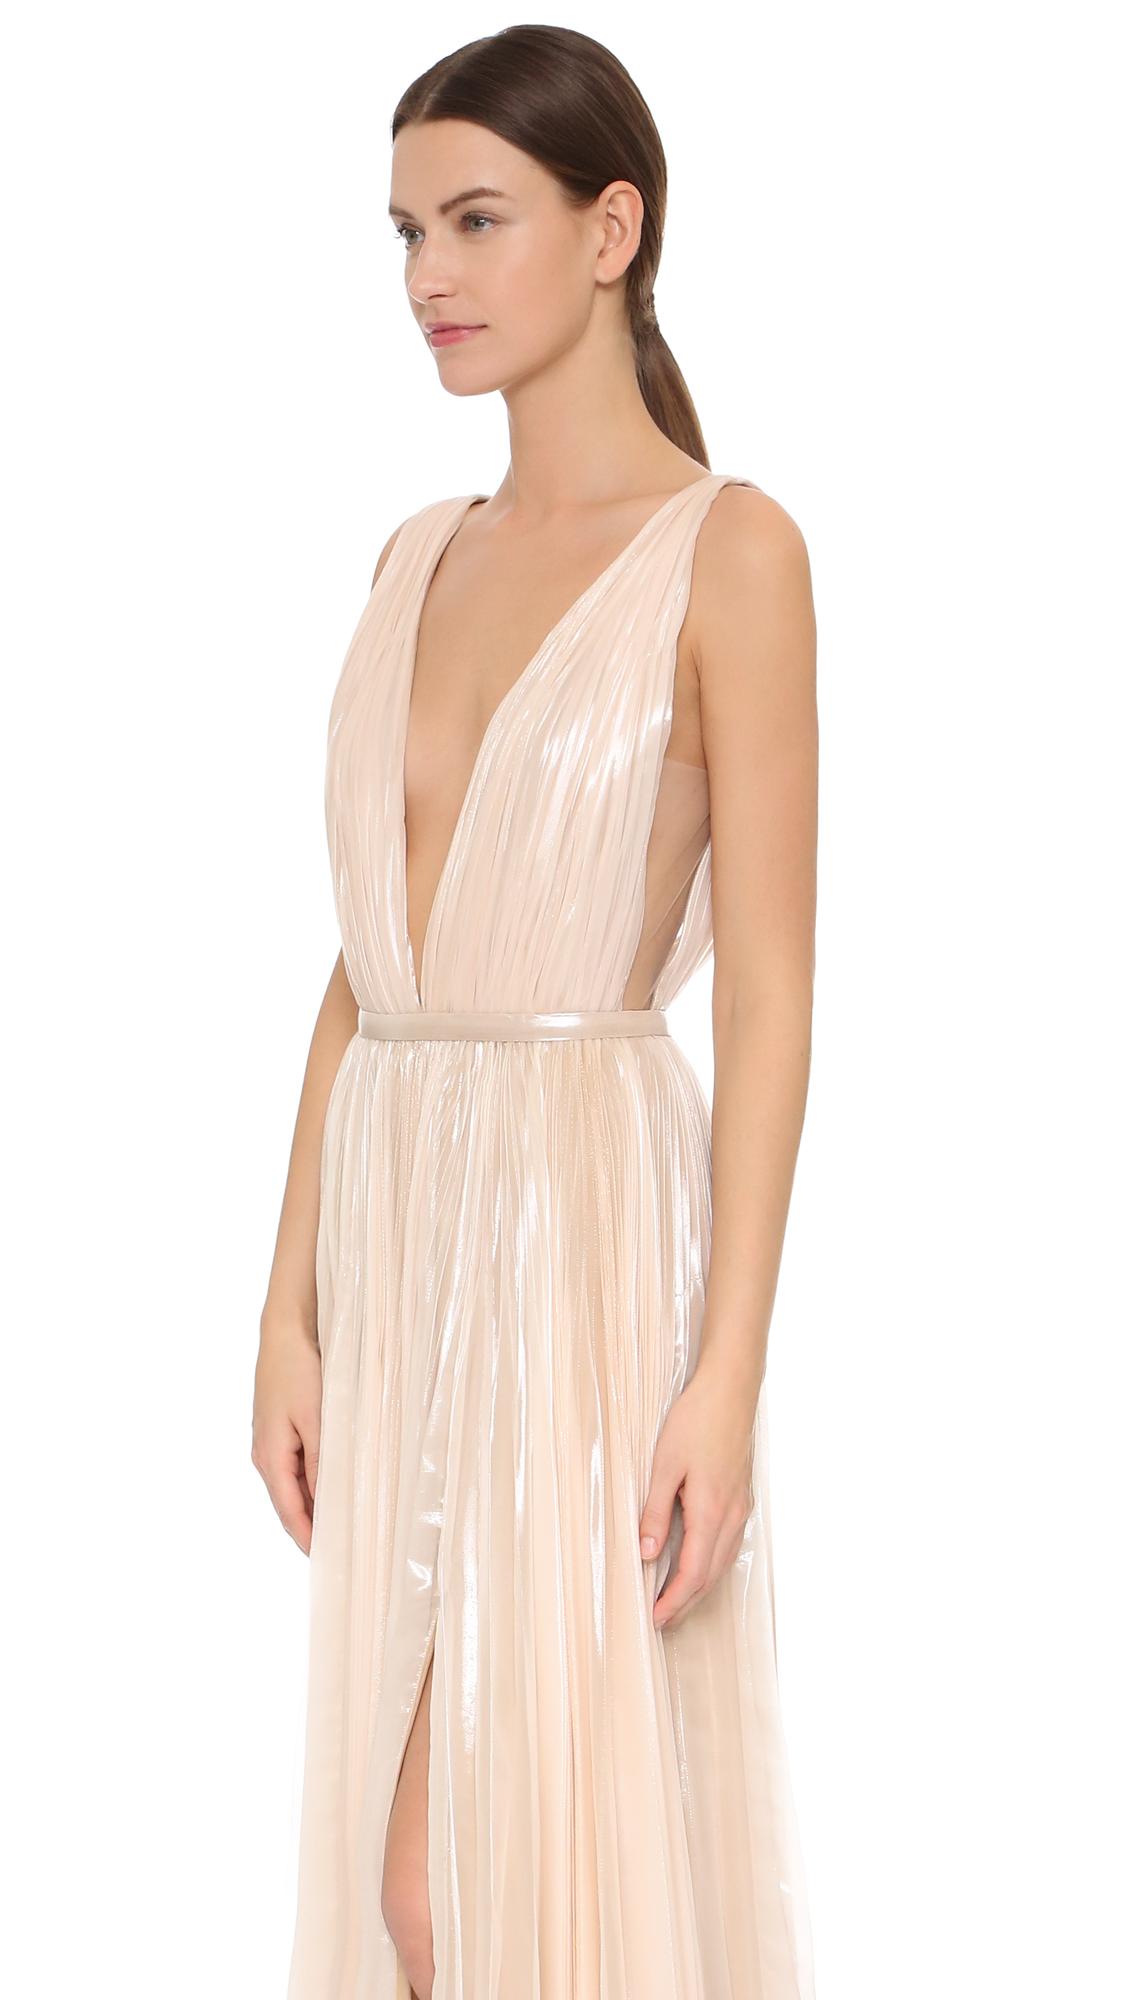 j mendel wedding dress J Mendel Kaia Gown SHOPBOP Extra 25 Off Sale Styles Use Code SCORE17